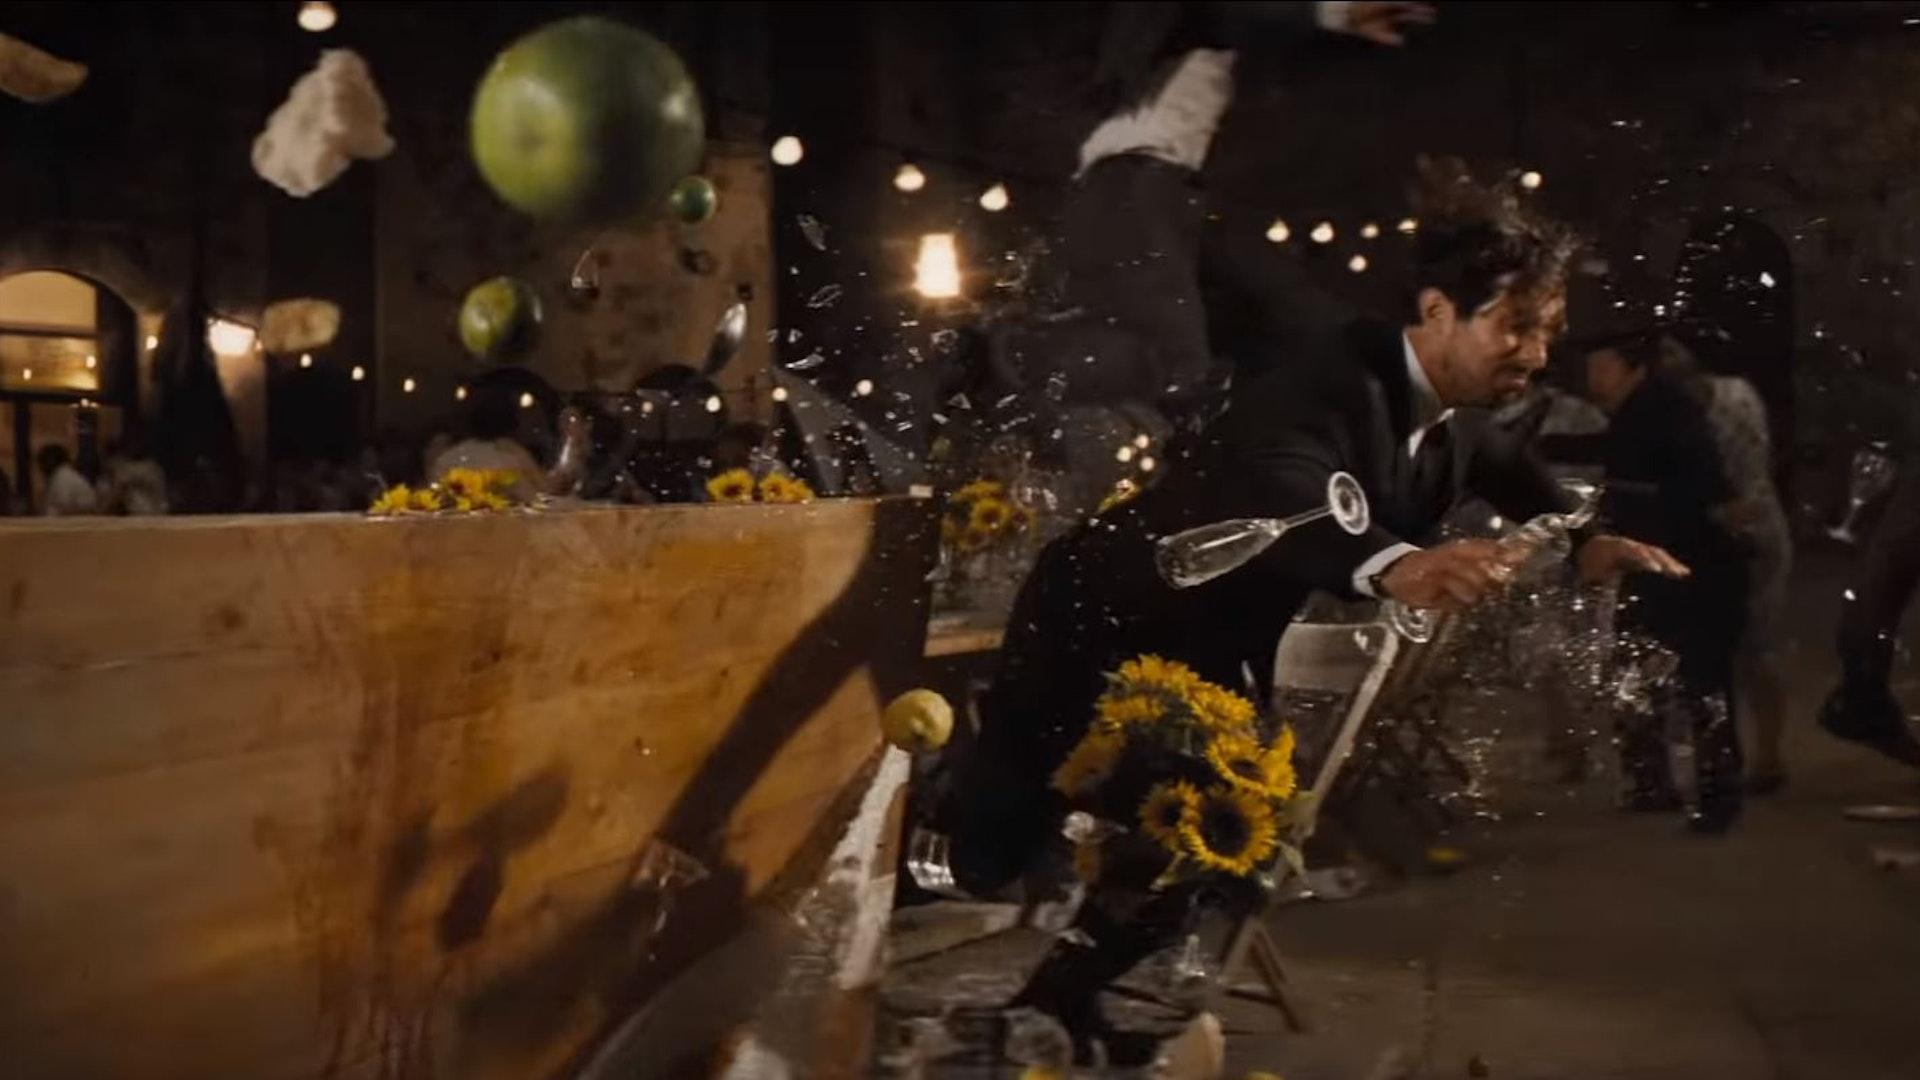 artemis-fowl-teaser-trailer-11-troll-attack-italy